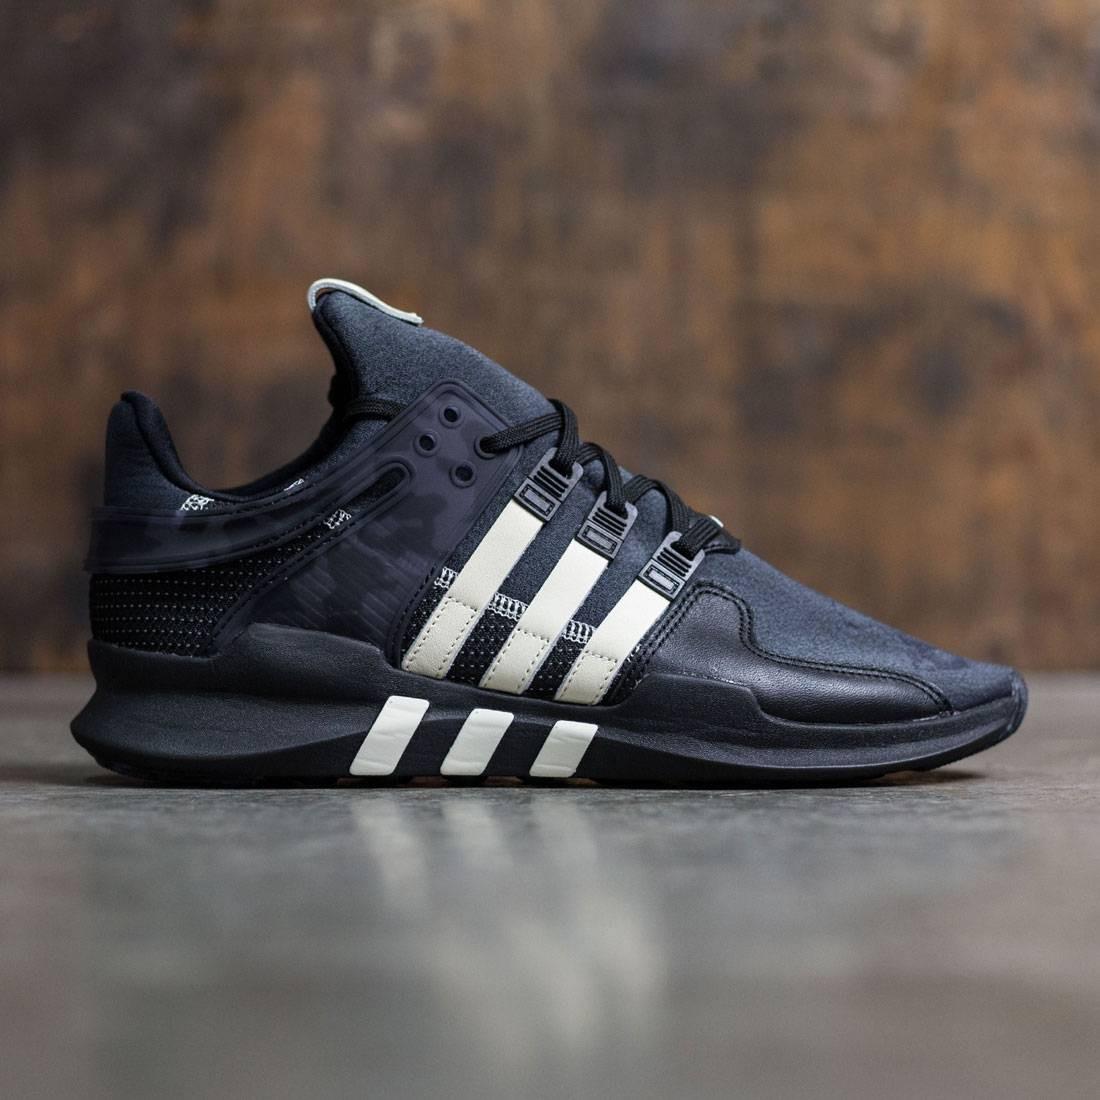 the best attitude 4b63e 07430 adidas Men's EQT Support RF (Black Turbo Red) KicksUSA